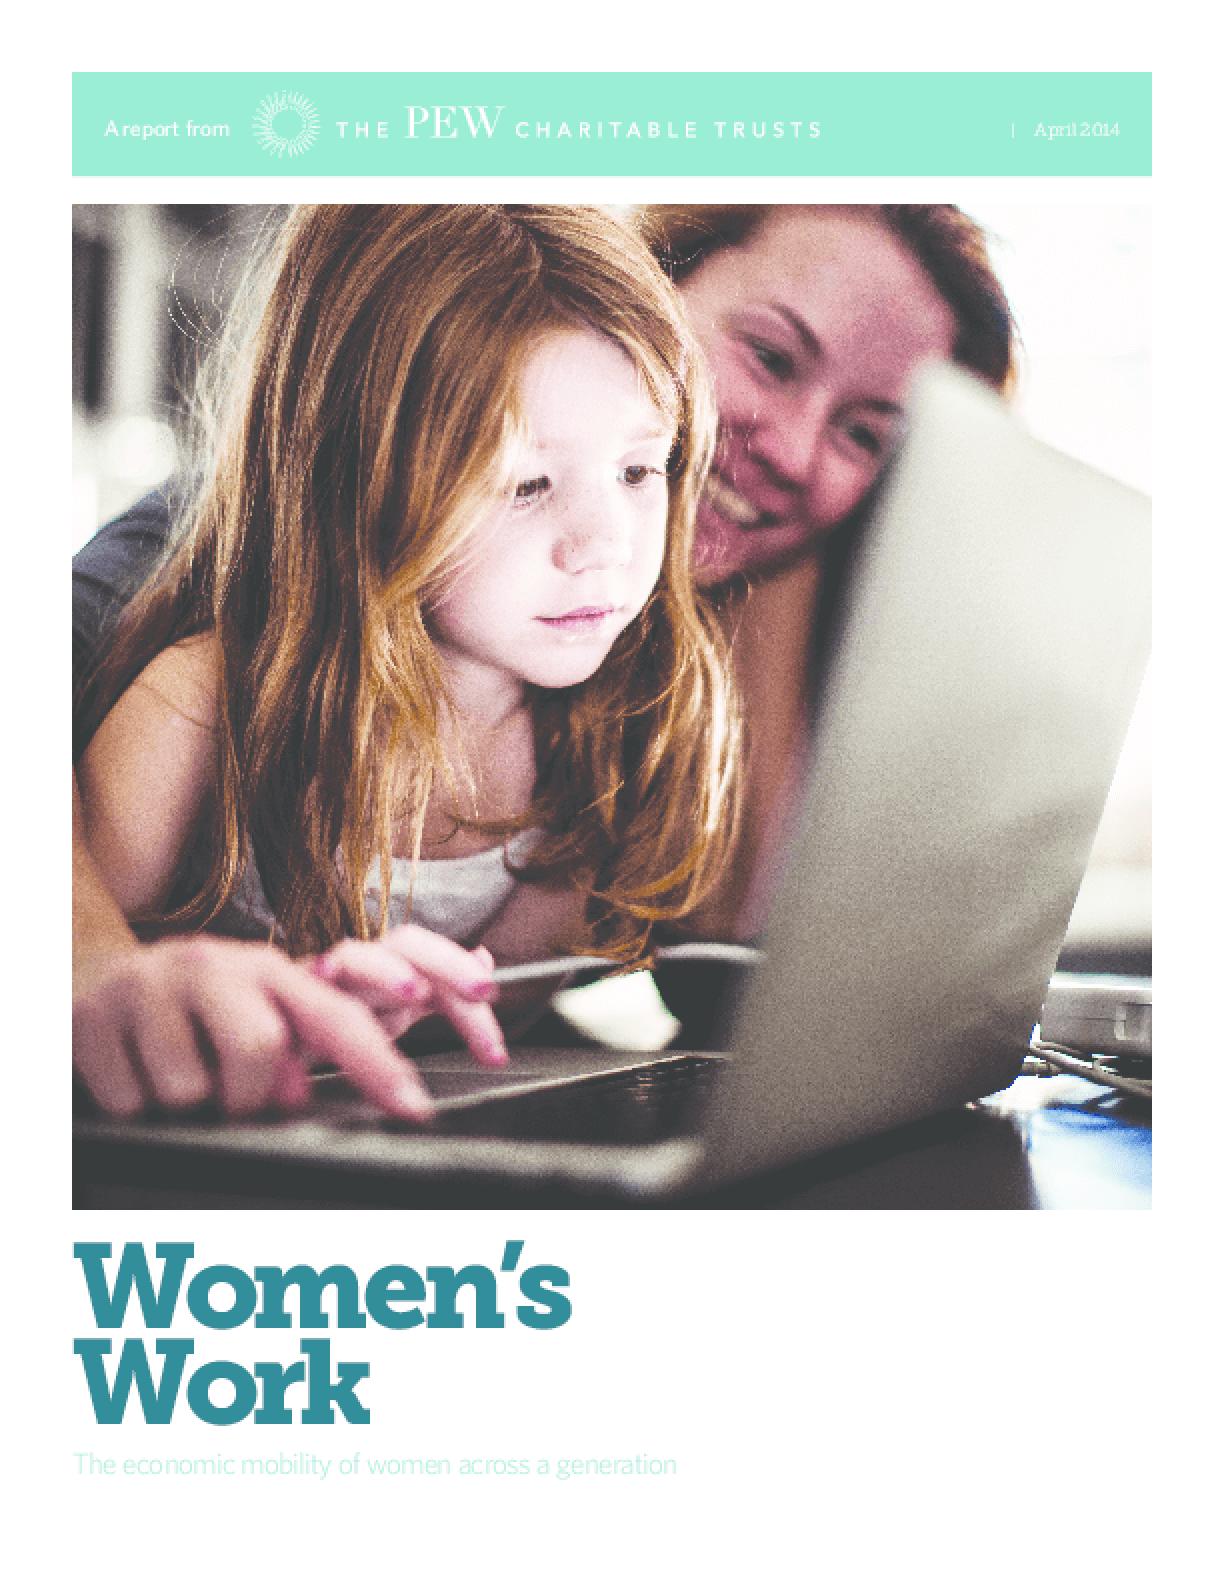 Women's Work: The Economic Mobility of Women Across a Generation